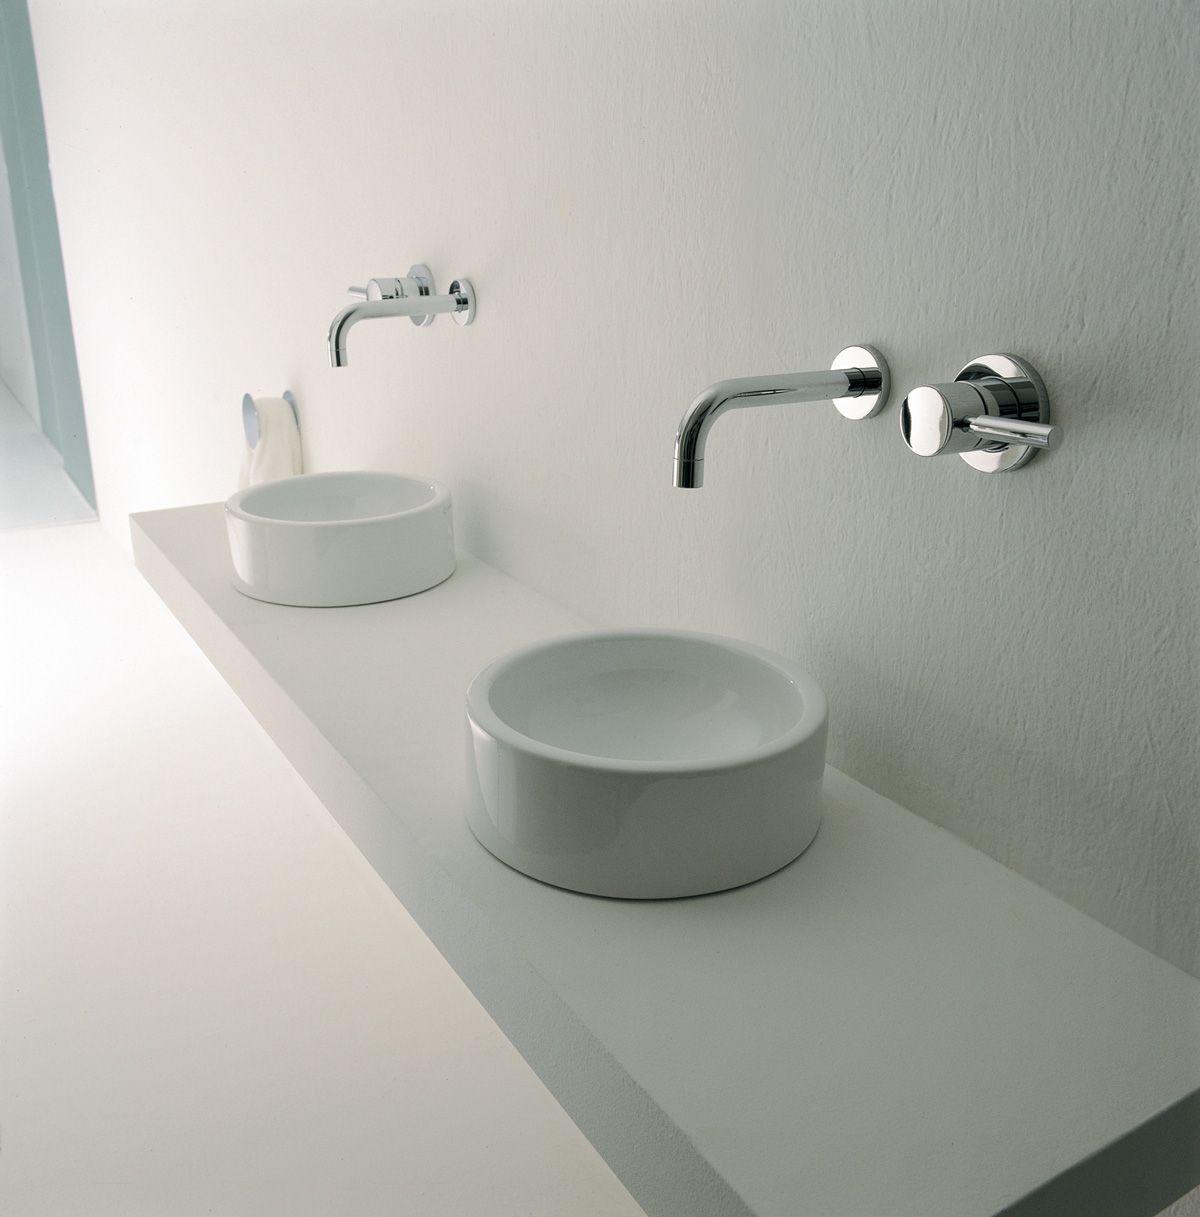 Beau TWIN | Flaminia Ceramic. TWIN | Flaminia Ceramic Bathroom Fixtures ...